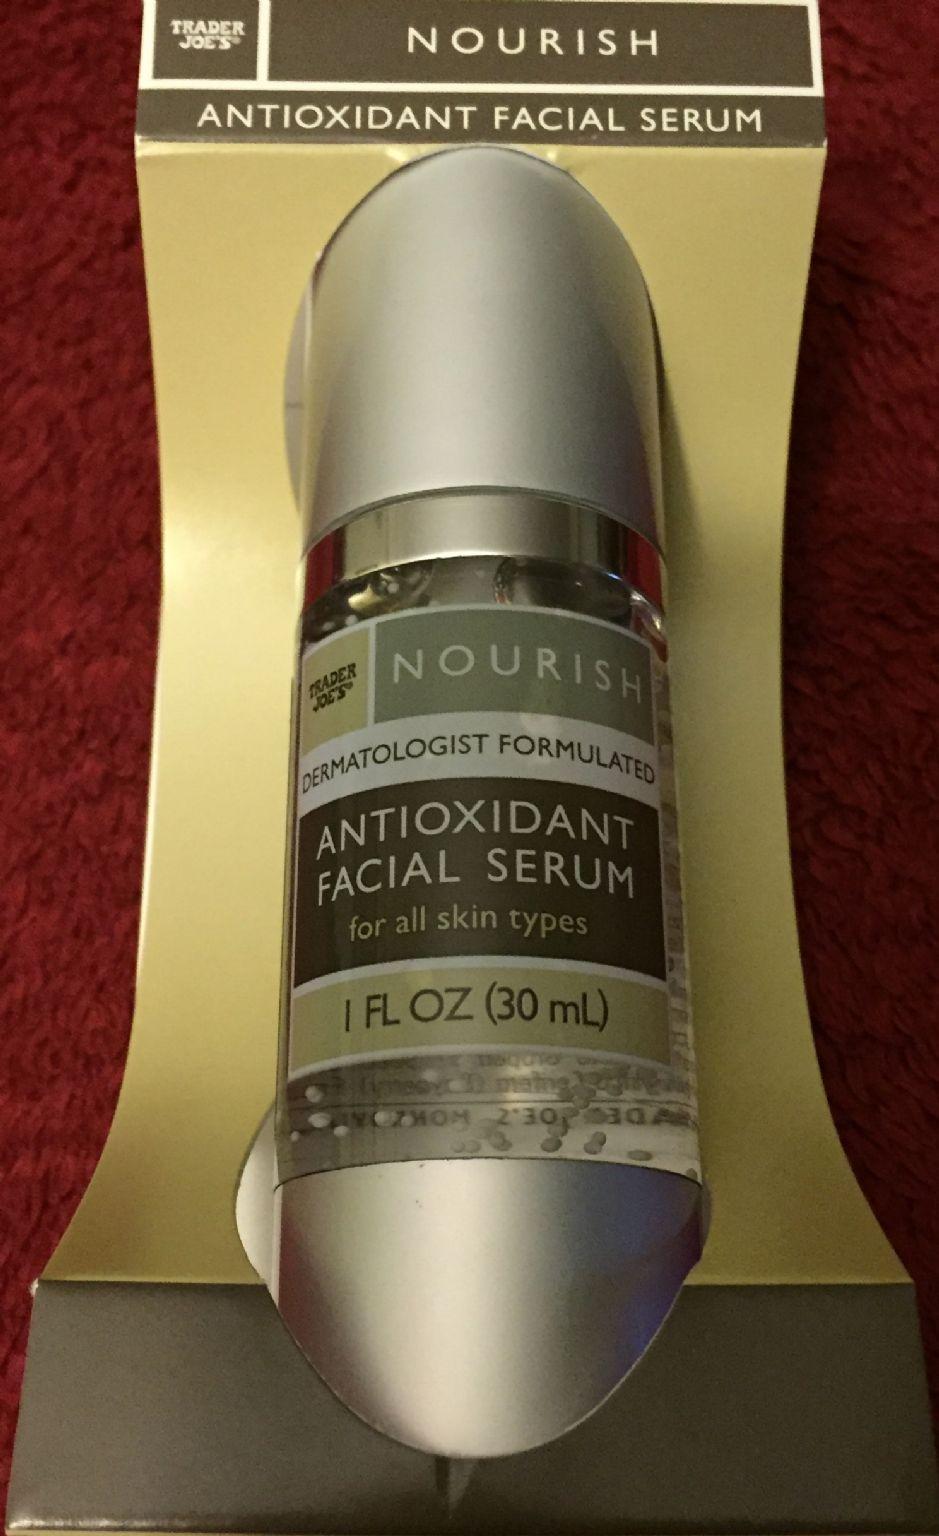 trader joe 39 s antioxidant facial serum reviews photo ingredients makeupalley. Black Bedroom Furniture Sets. Home Design Ideas